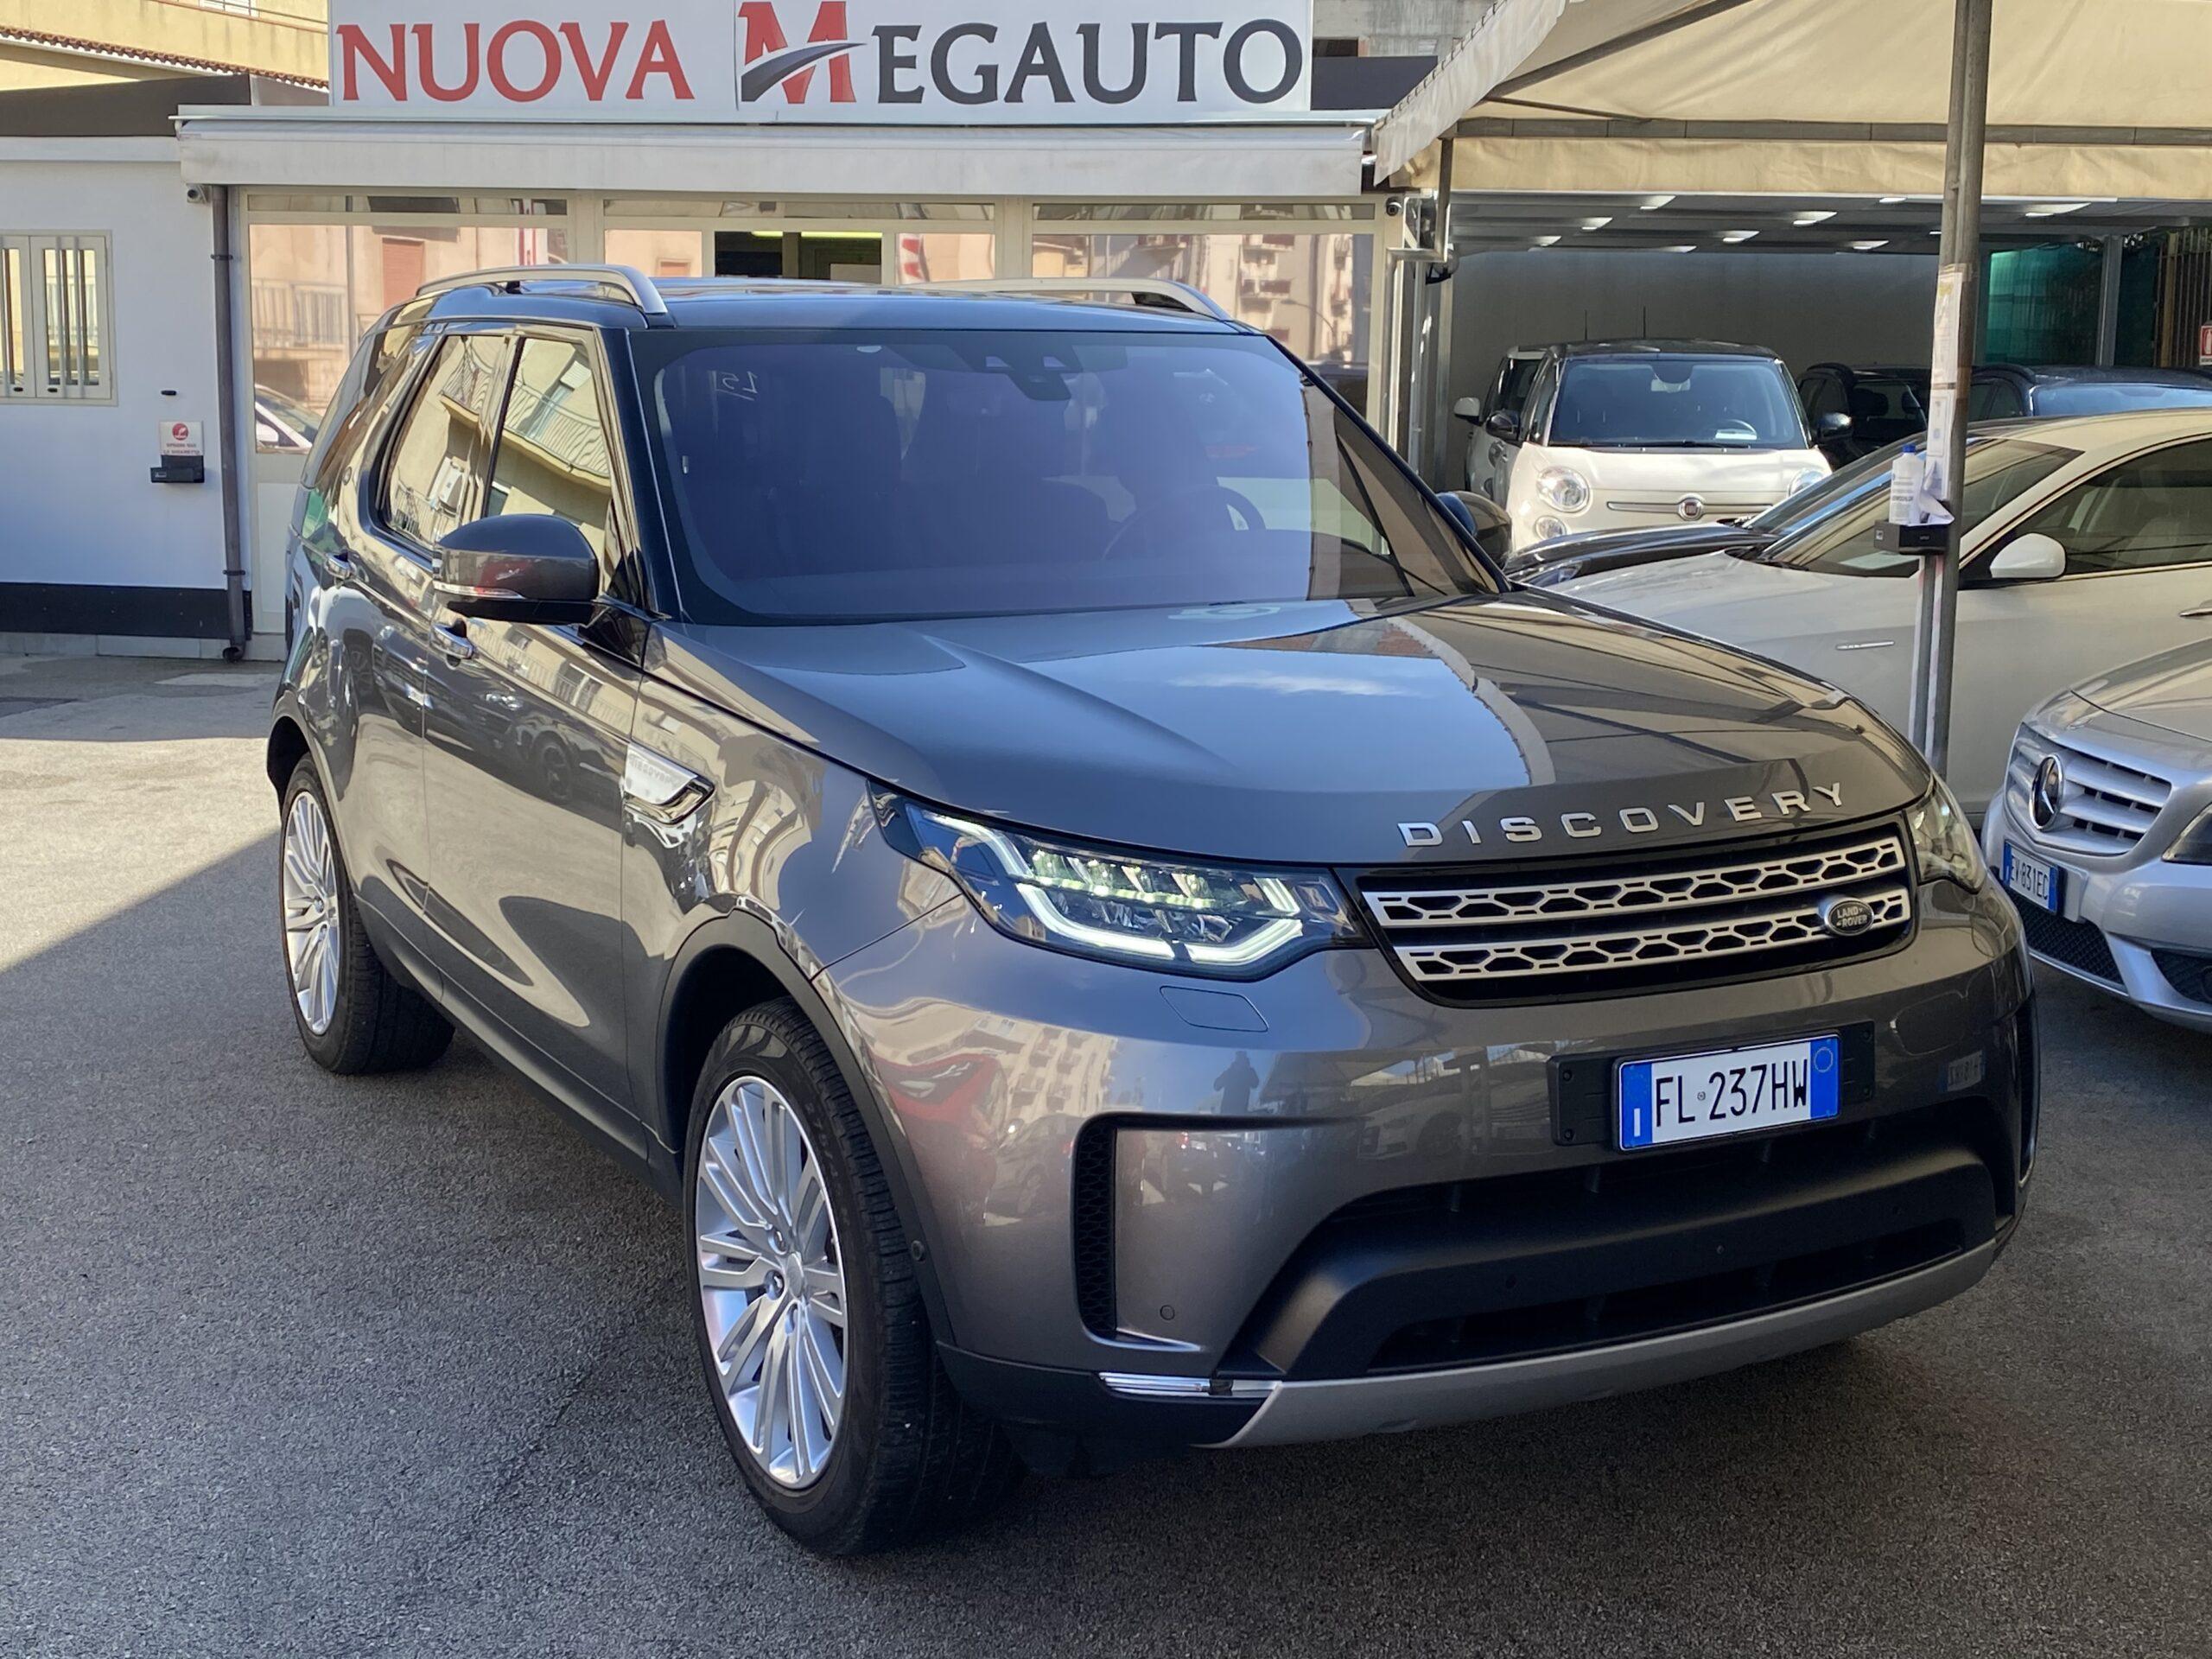 Land Rover Discovery 3.0 TD6 249 CV HSE Luxury 7 Posti 2018